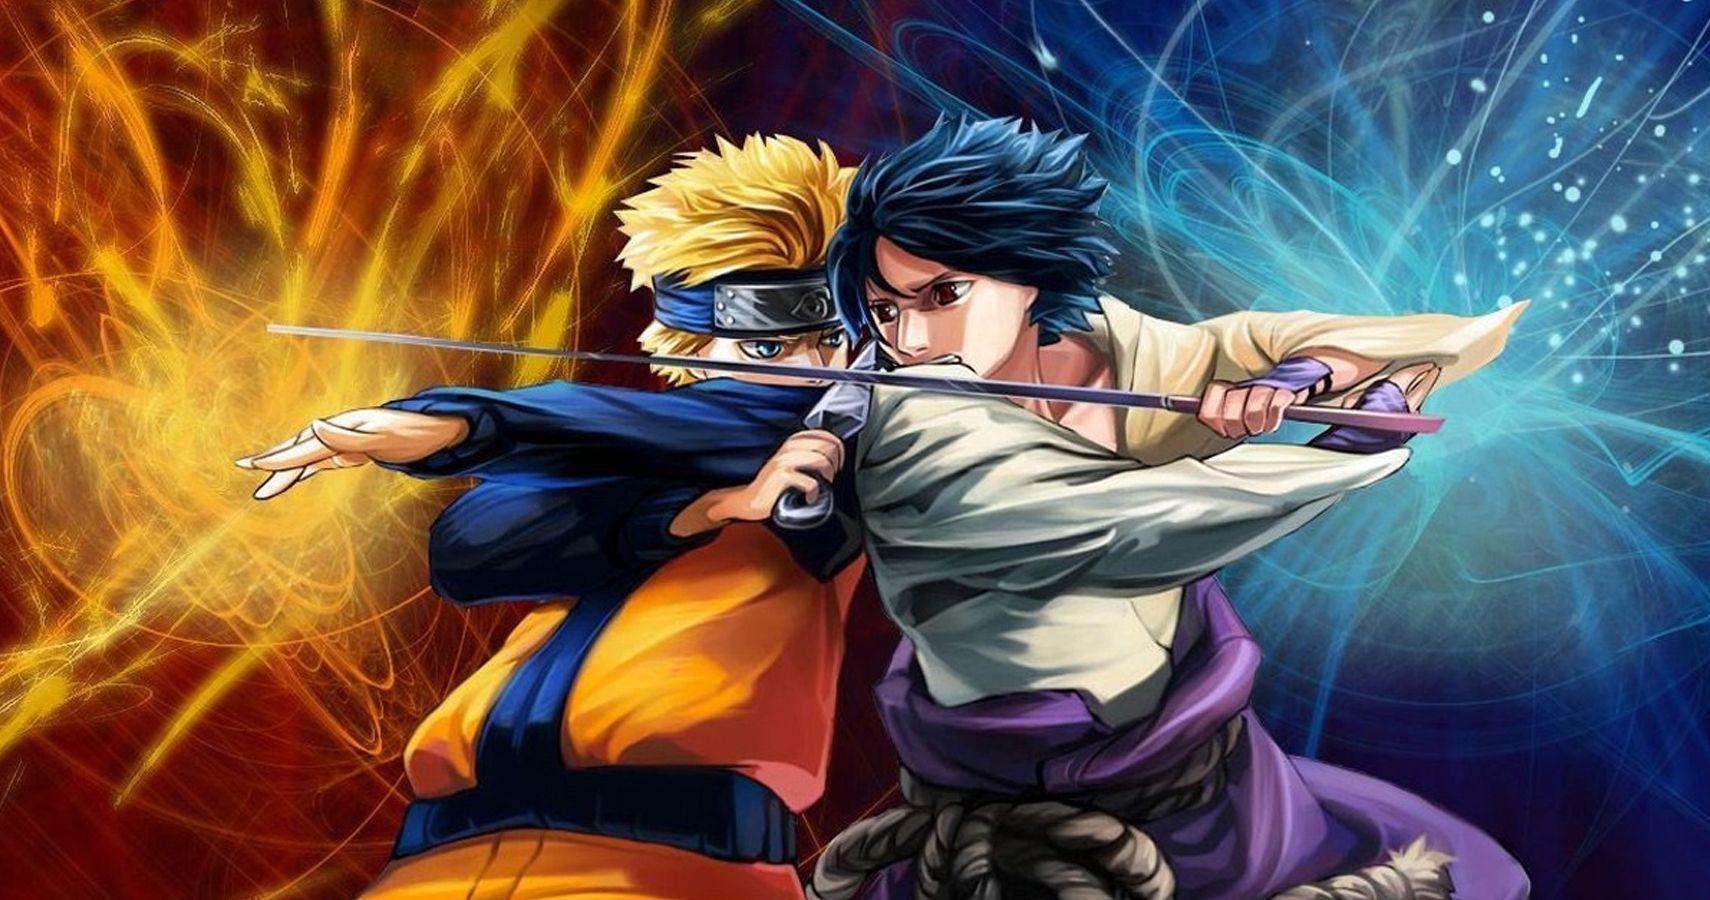 Naruto: 20 Characters That Are Stronger Than Sasuke